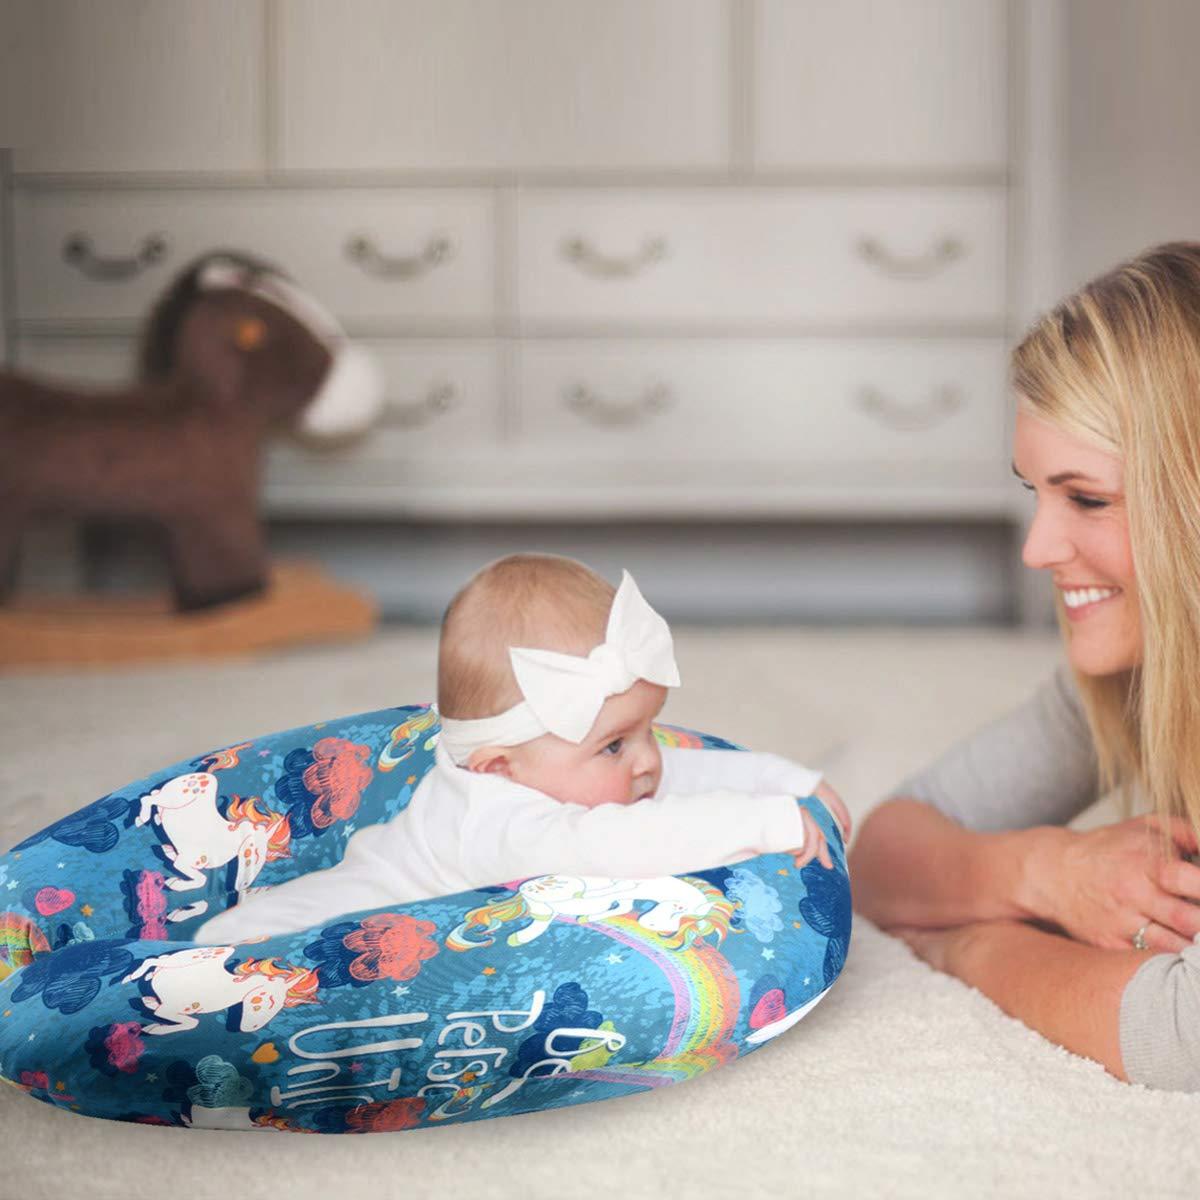 Amazon.com: Sylfairy - Funda de almohada de lactancia grande ...